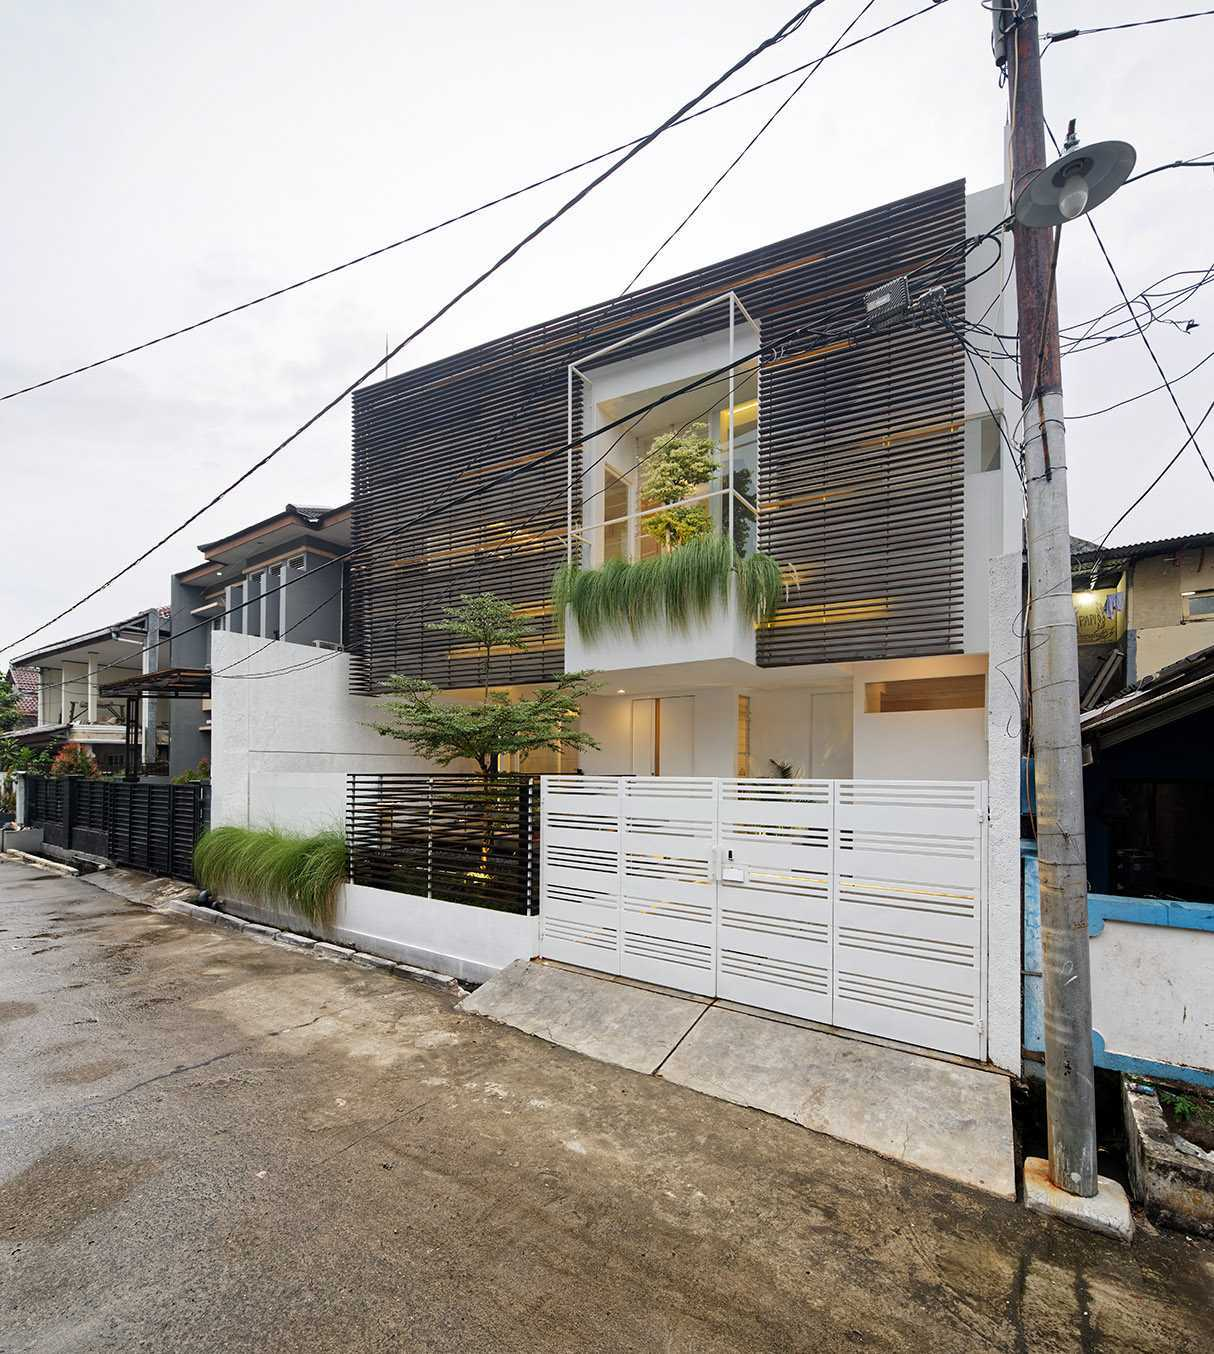 Delution Inset House Jatibening, Pondokgede, Bekasi City, West Java, Indonesia Jatibening, Pondokgede, Bekasi City, West Java, Indonesia Side View Kontemporer,modern  36733